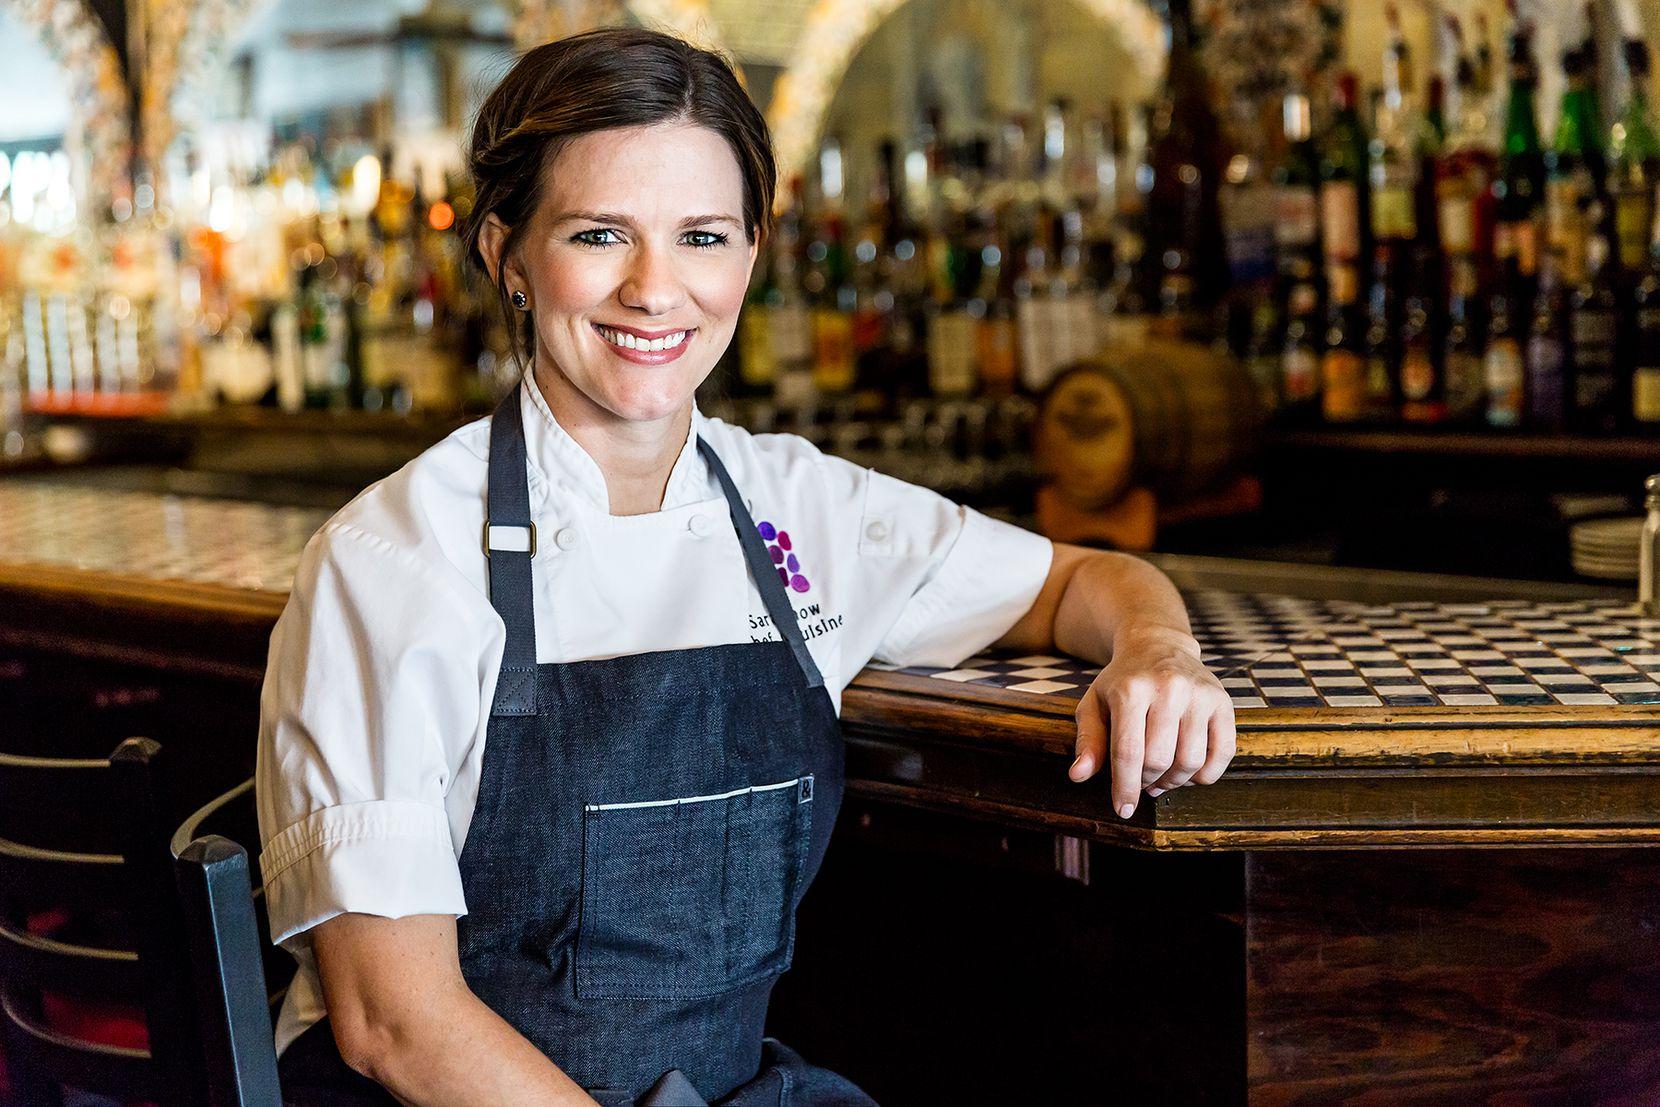 Sarah Chastain, 29, chef de cuisine at The Grape